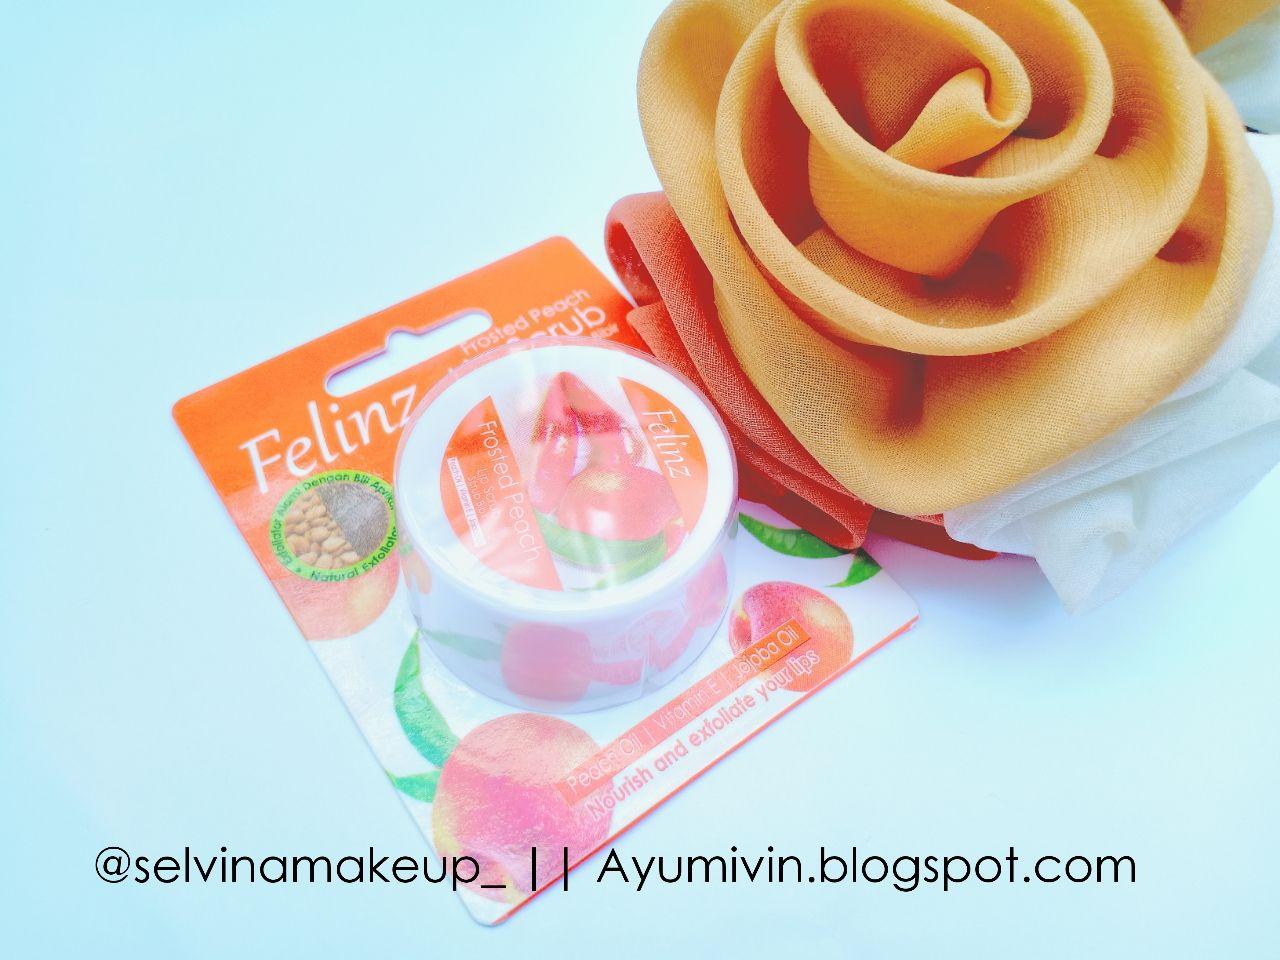 gambar review ke-2 untuk Felinz Lip Scrub Frosted Peach